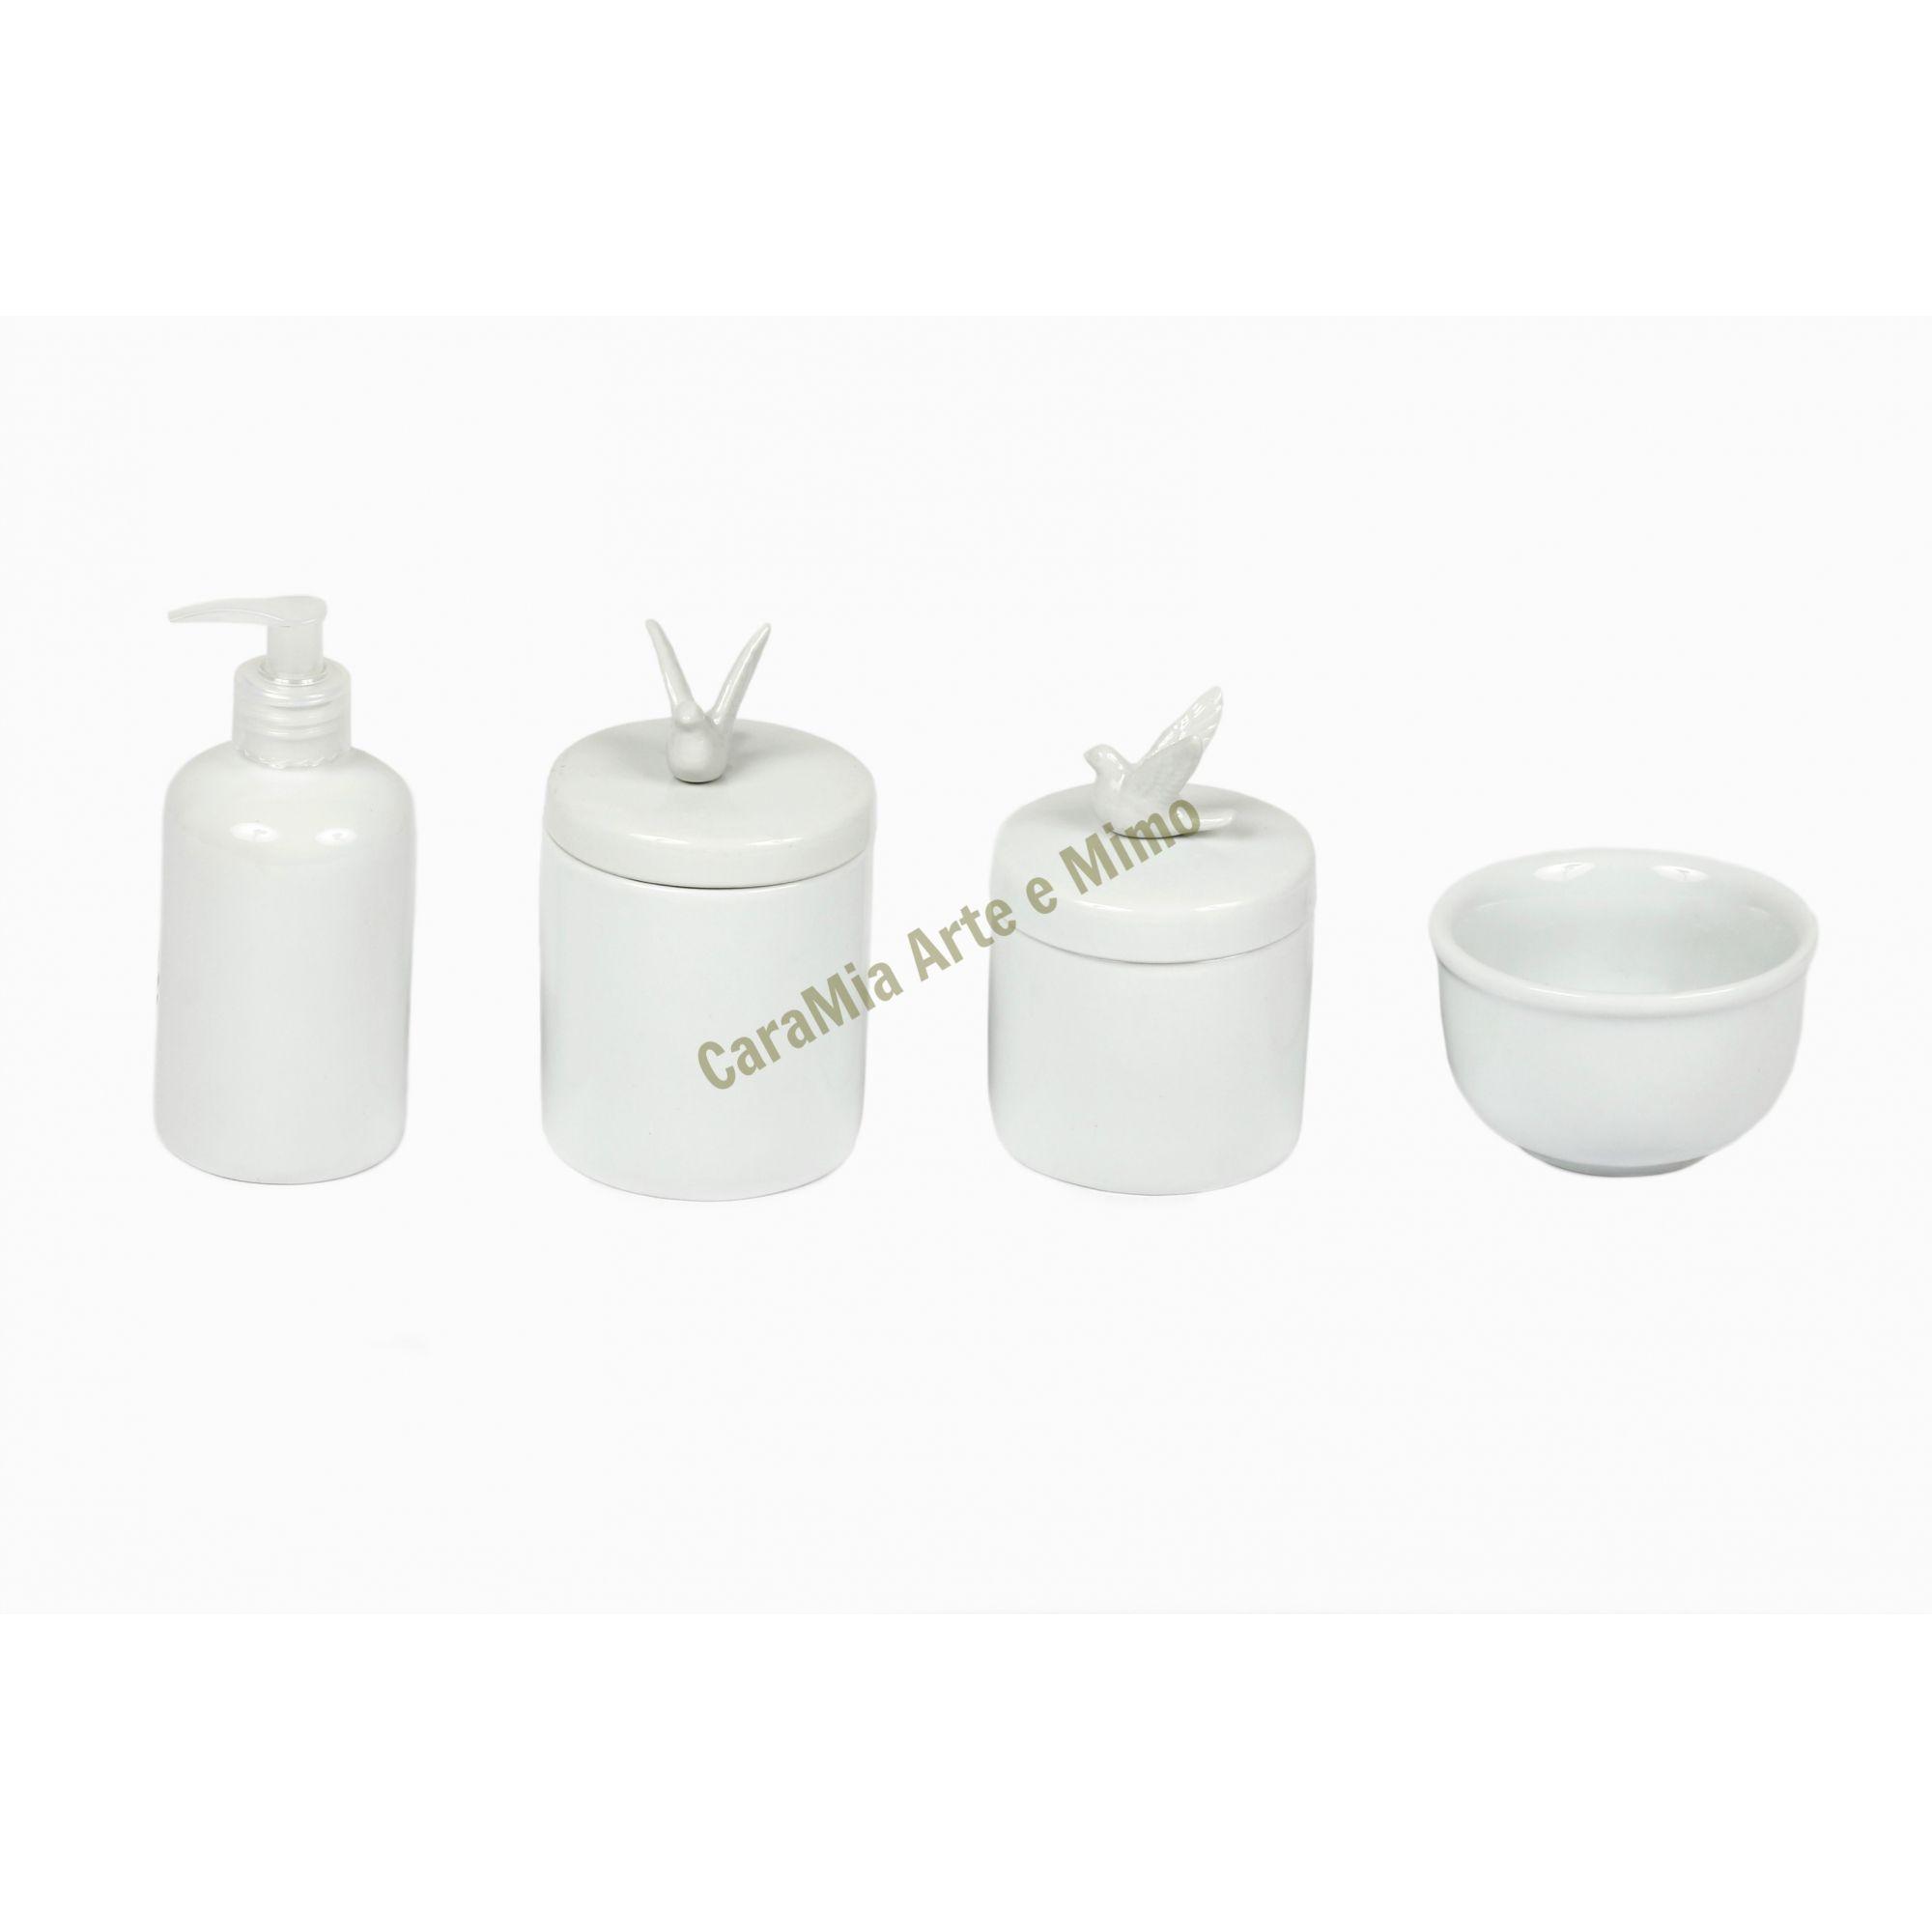 Kit Higiene Bebê Porcelana Branca | Pombas & Pombinhas | 4 peças